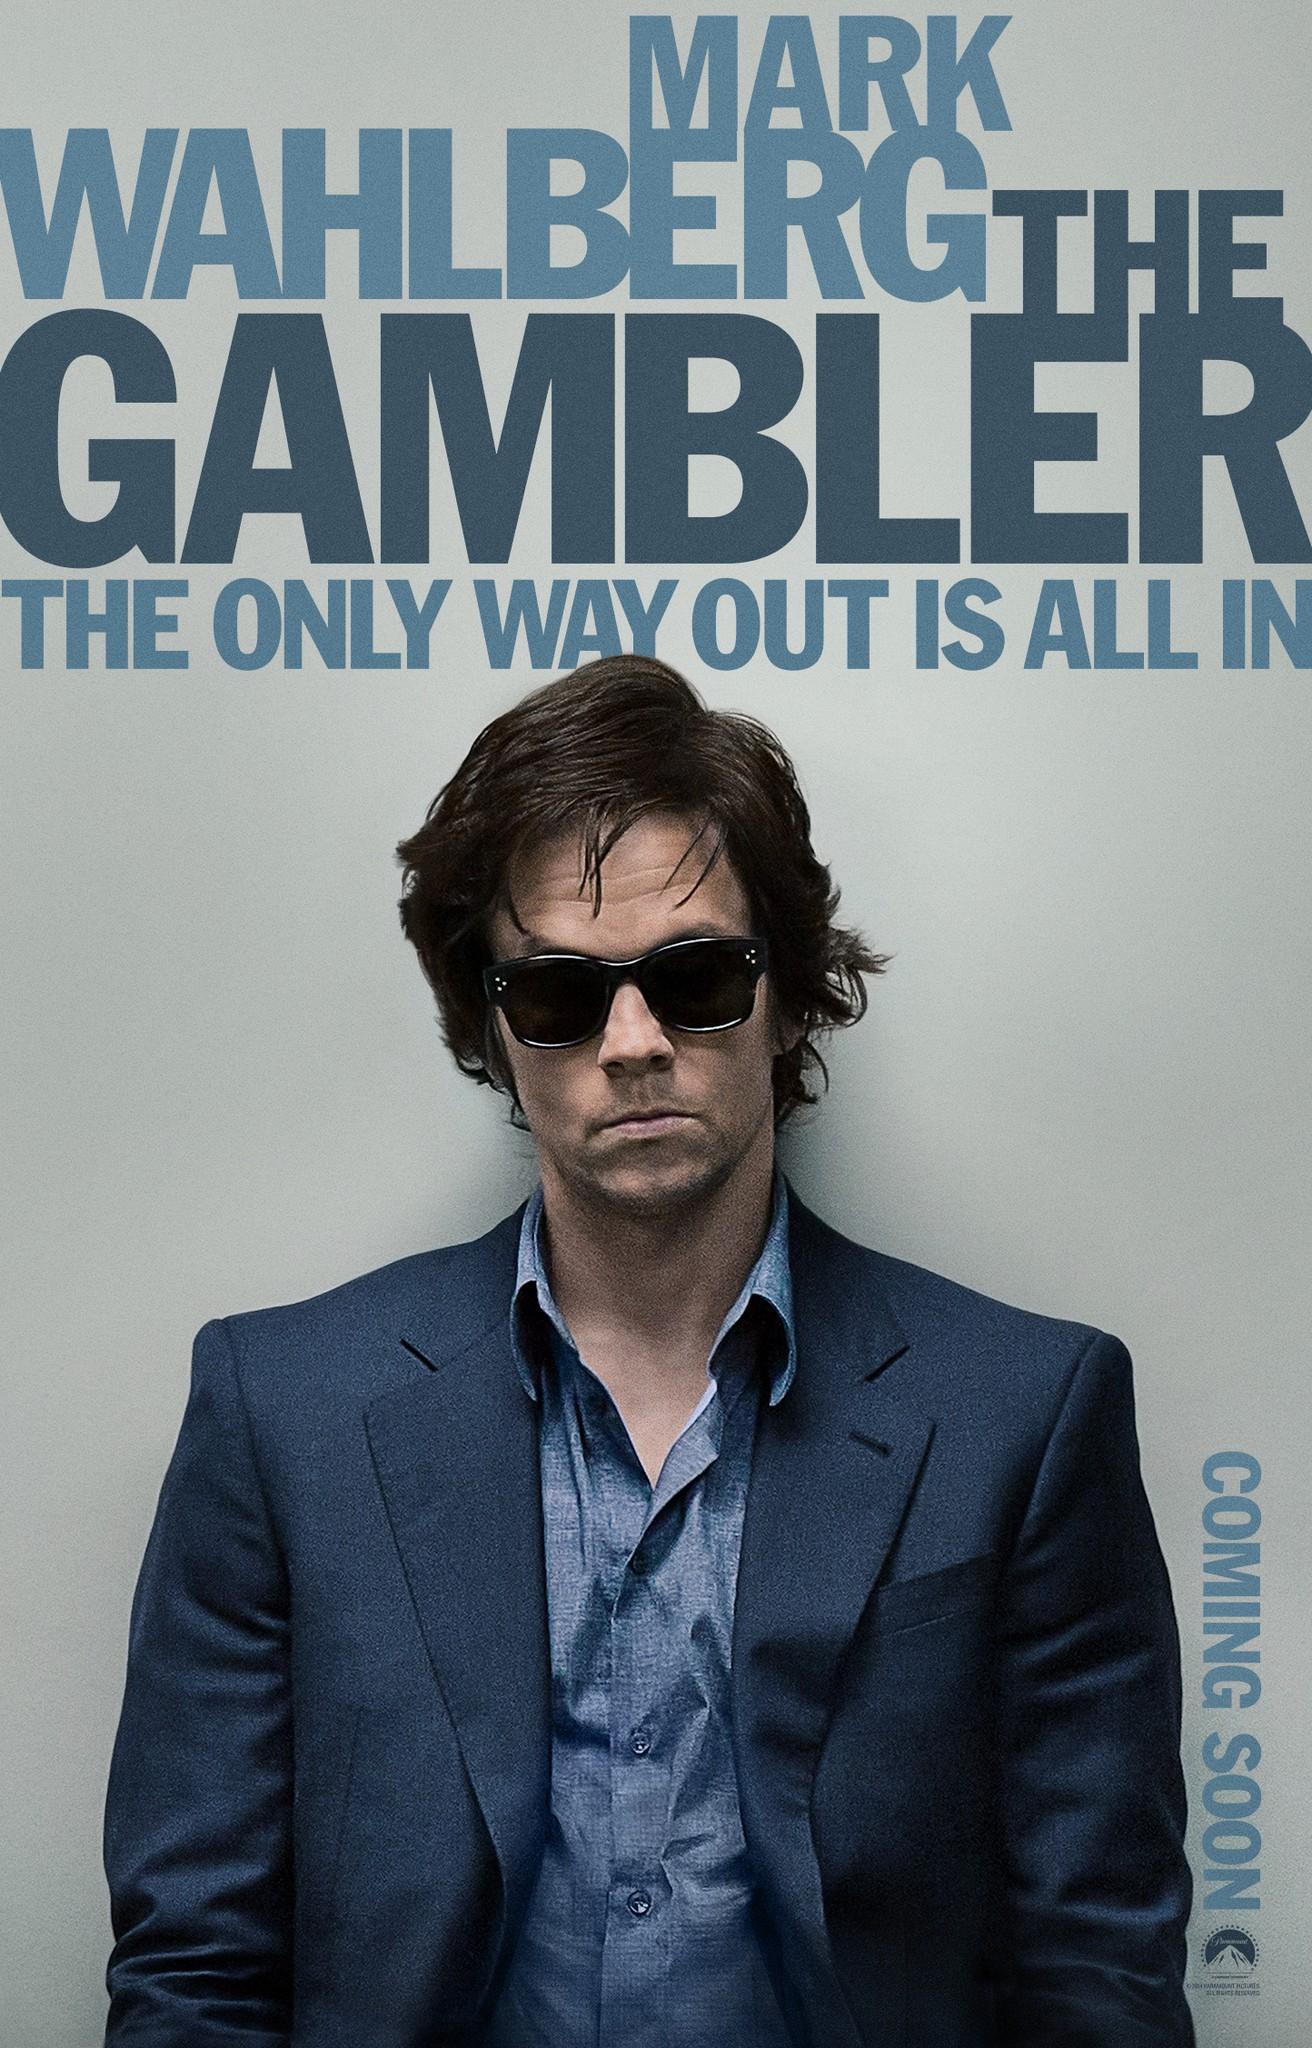 The-Gambler-Affiche-USA-Marl-Wahlberg.jpg